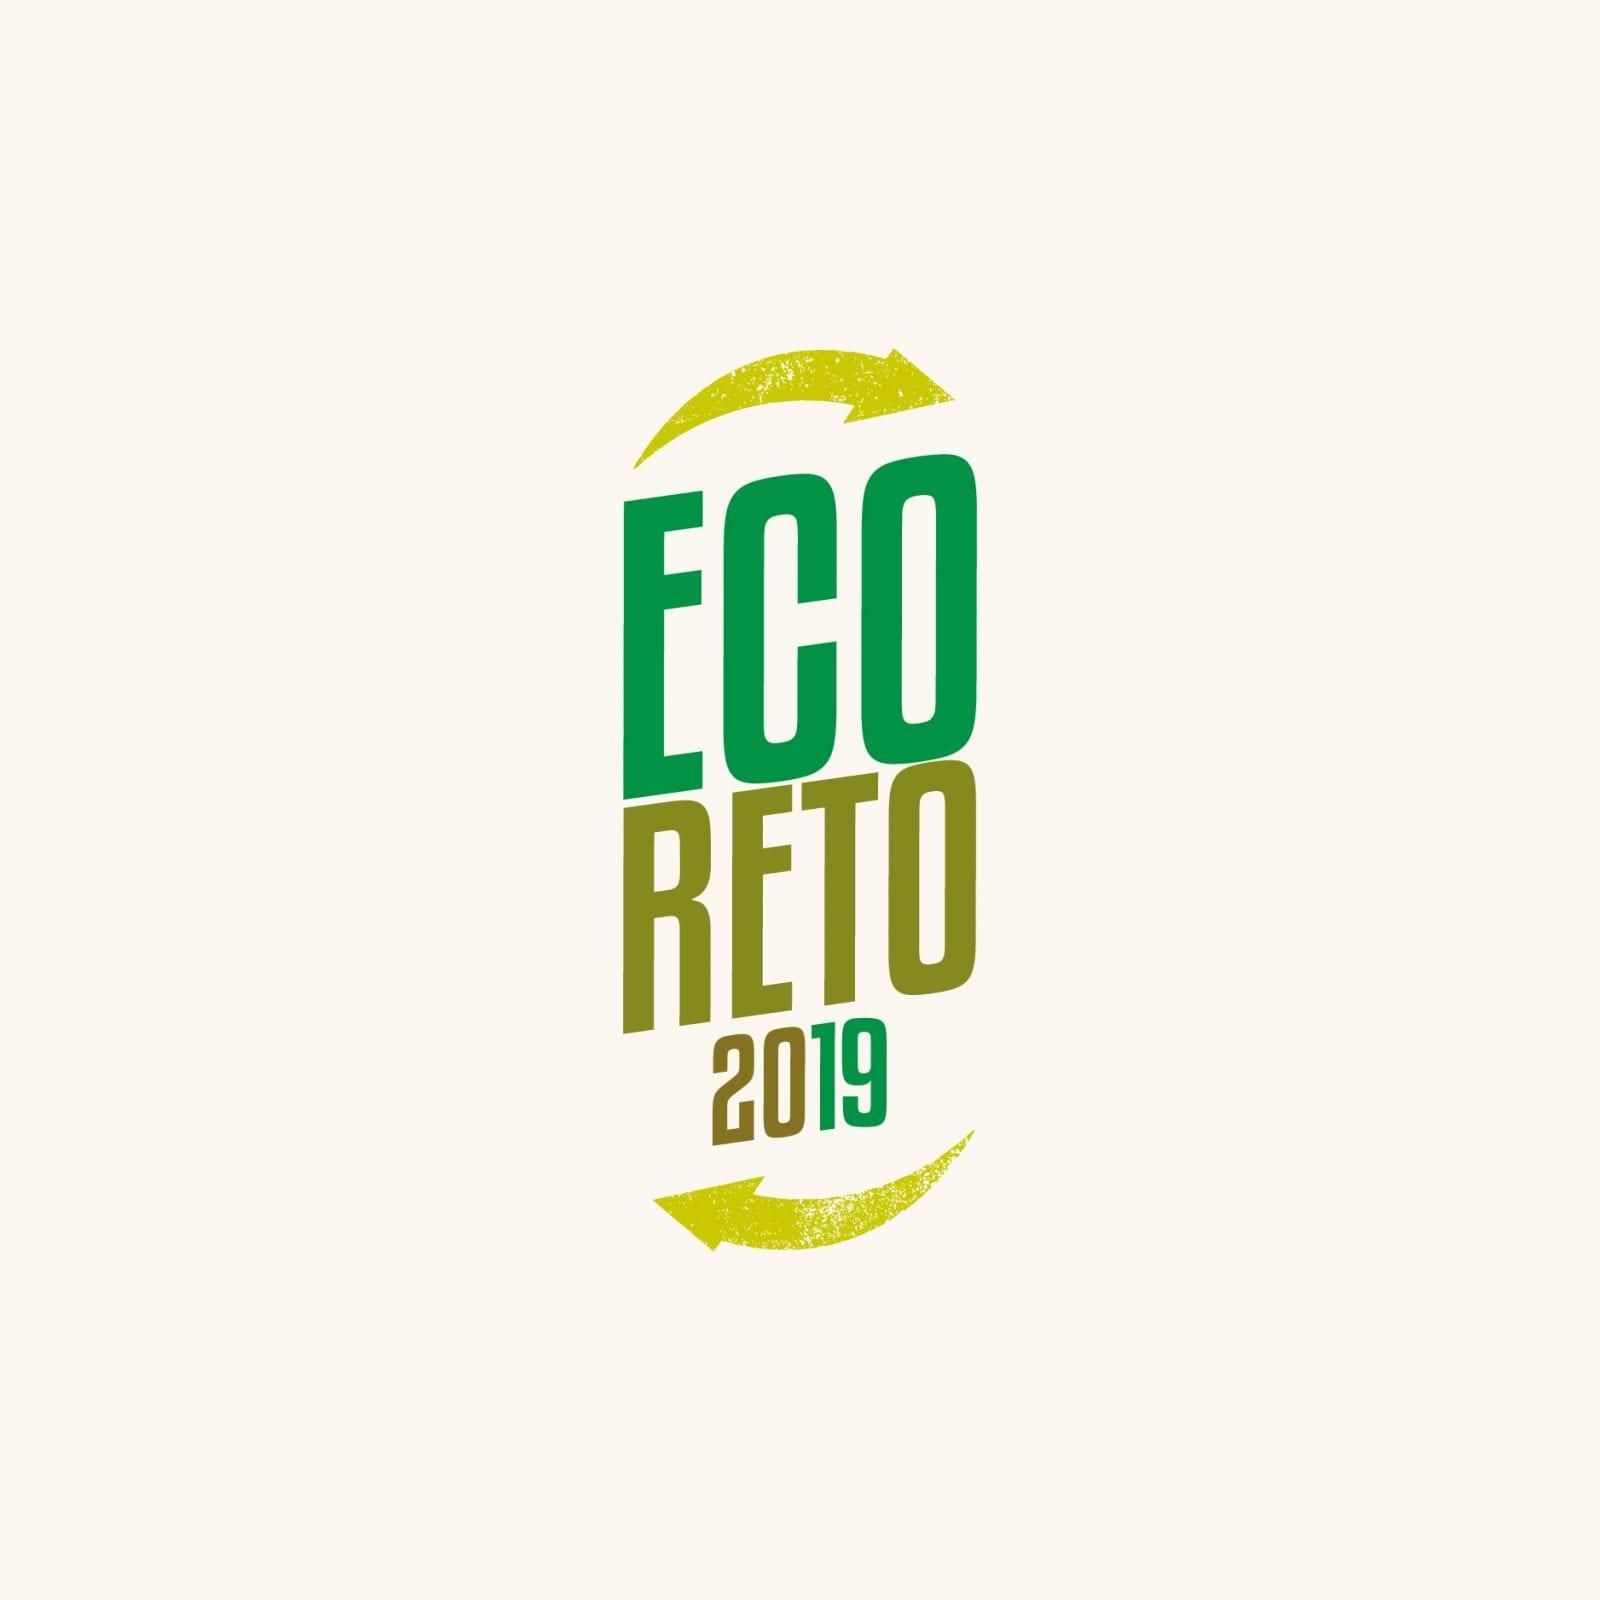 Eco Reto 2019 imagen